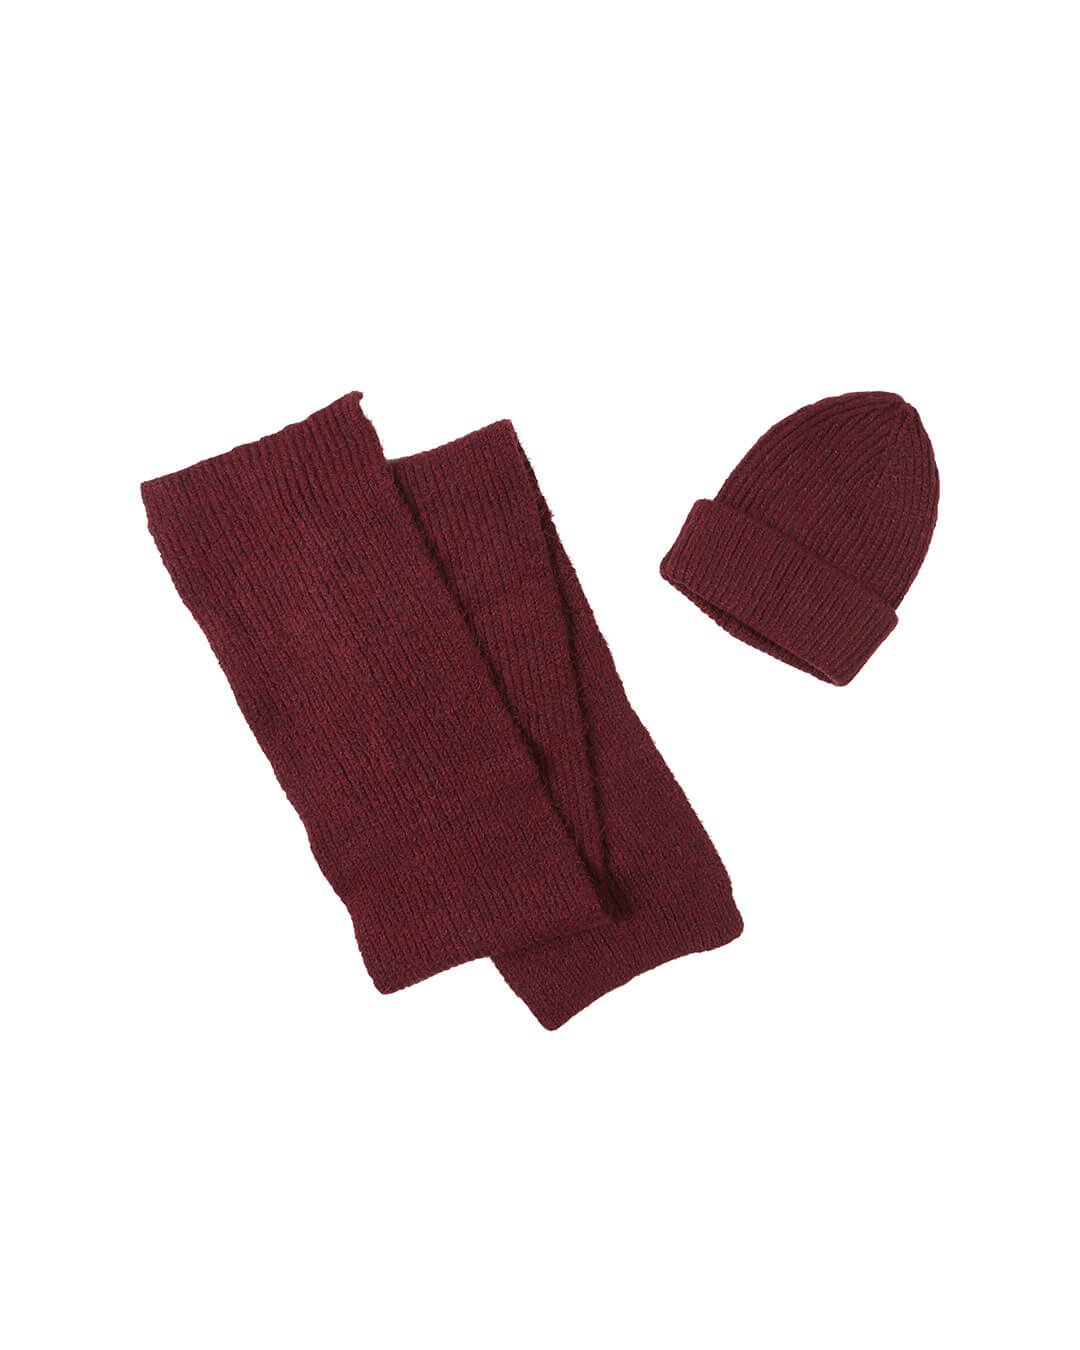 CMFW-19-61 - Lüx Atkı Bere Takımı - CMF Tekstil